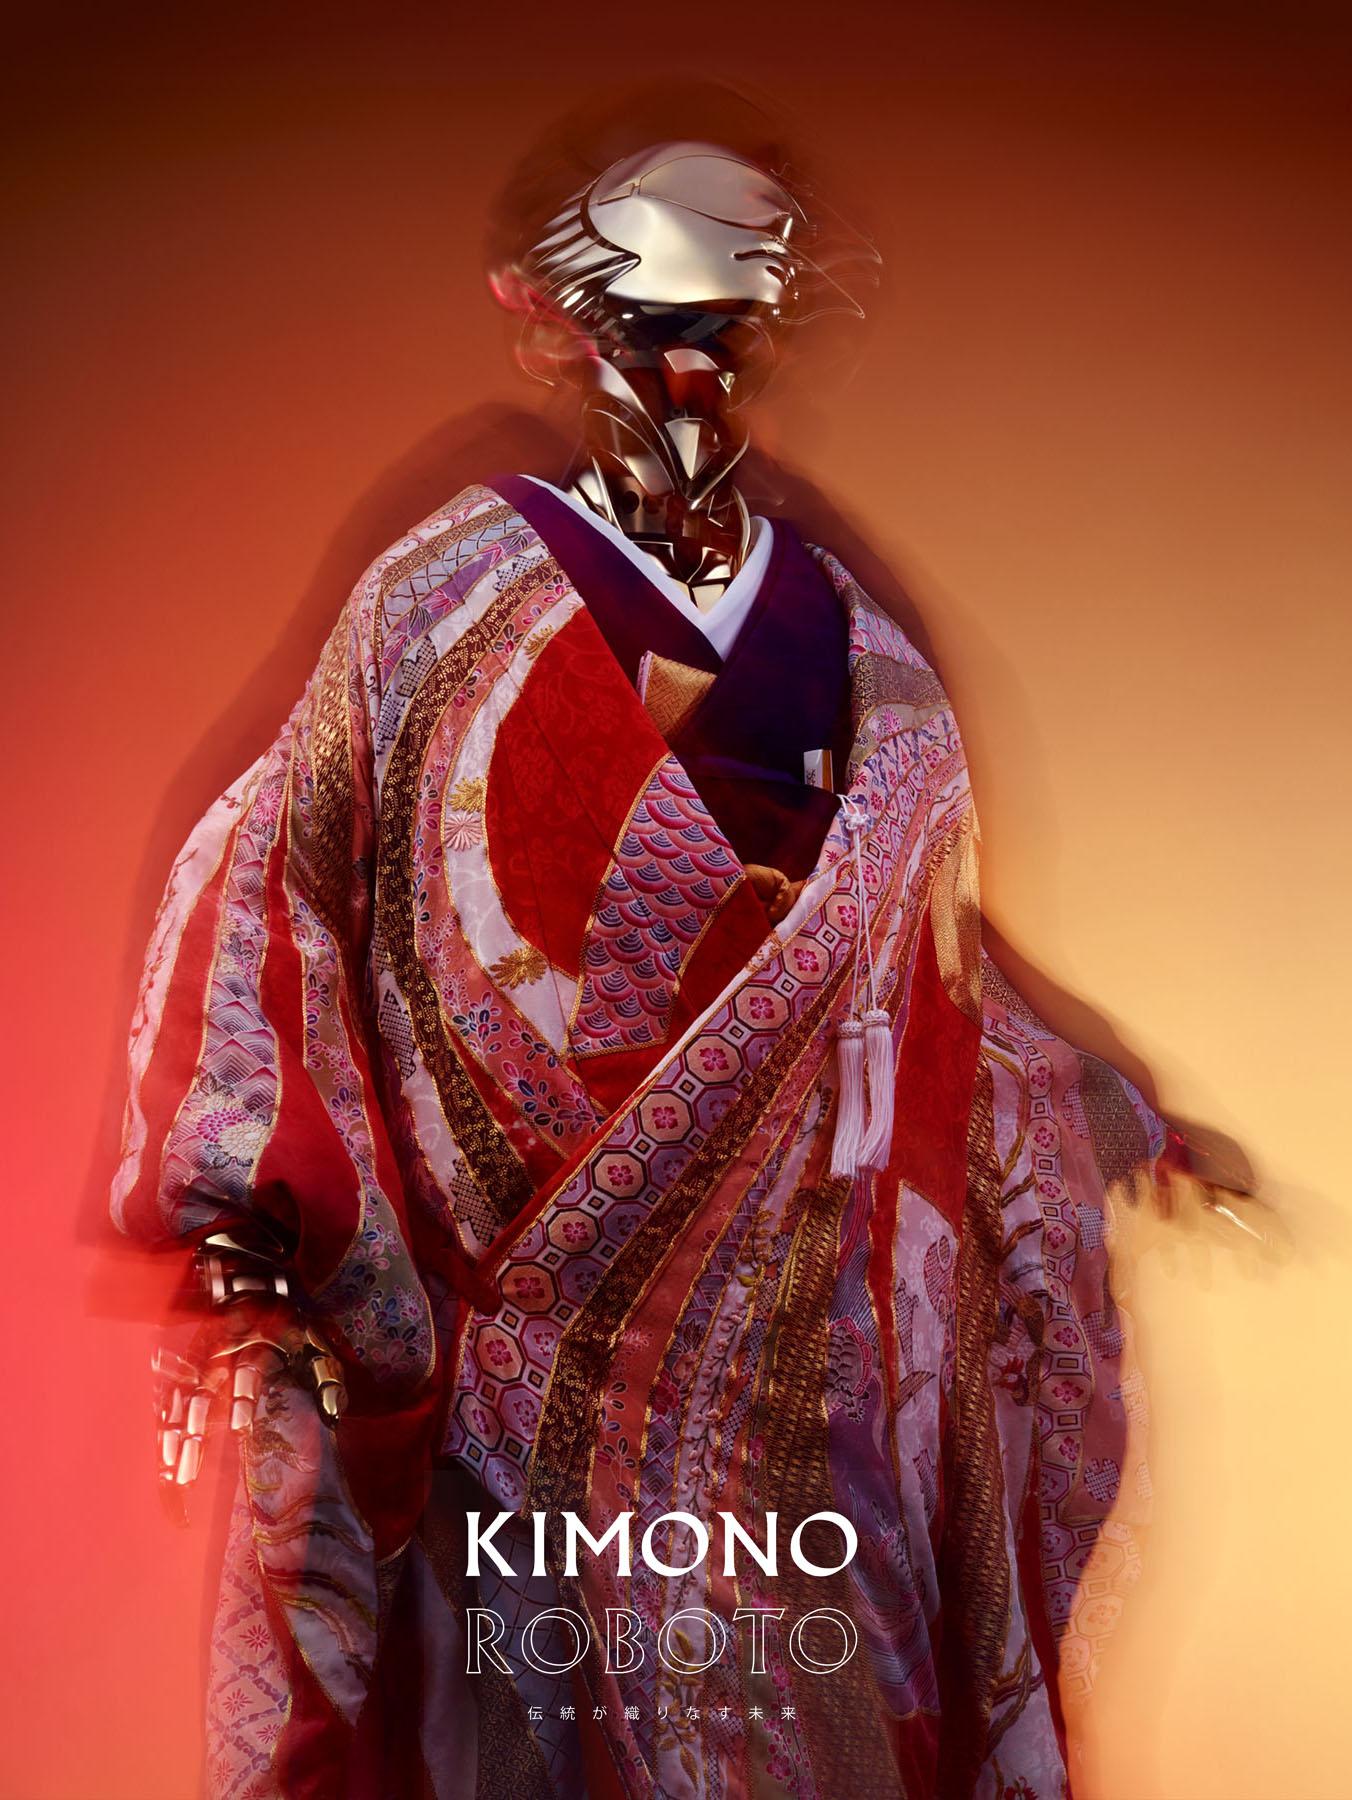 KimonoRoboto_posters 6